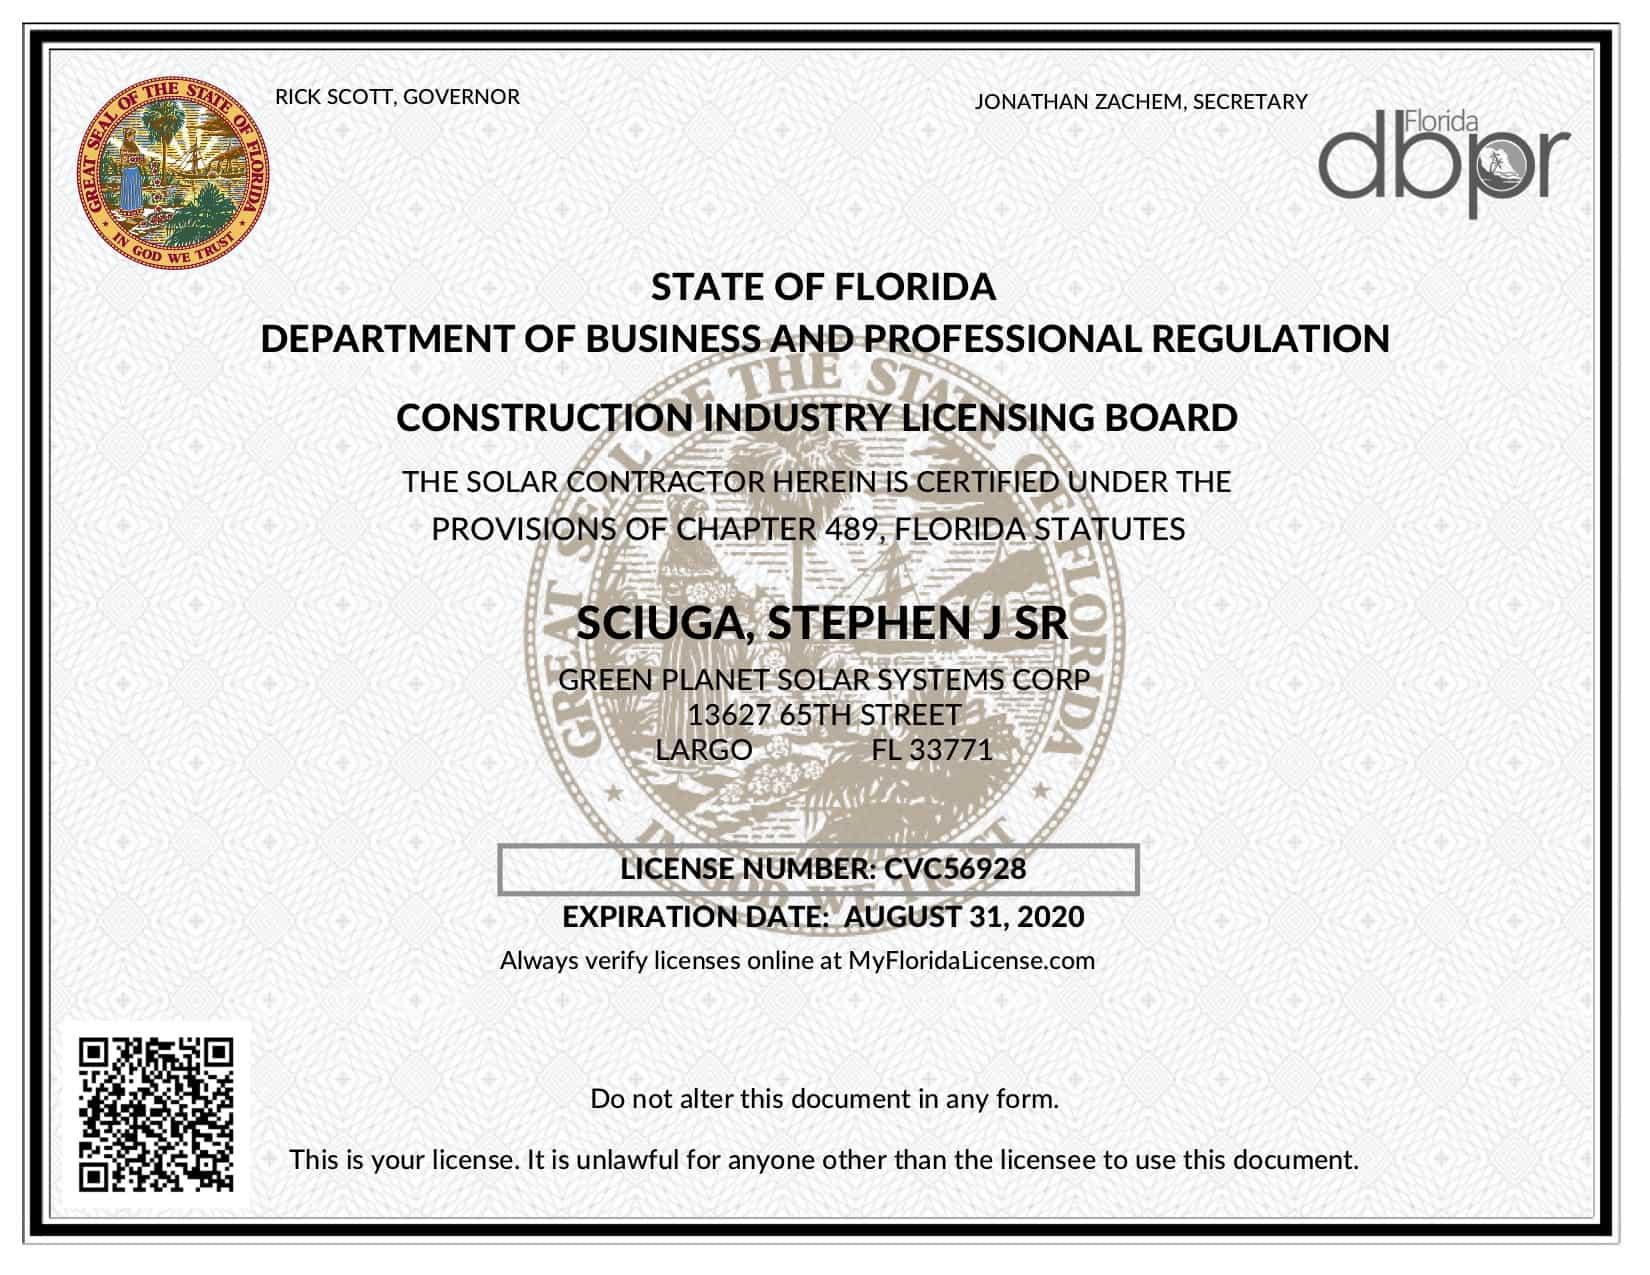 Green Planet Solar Systems Florida Solar Contractors License CVC56928